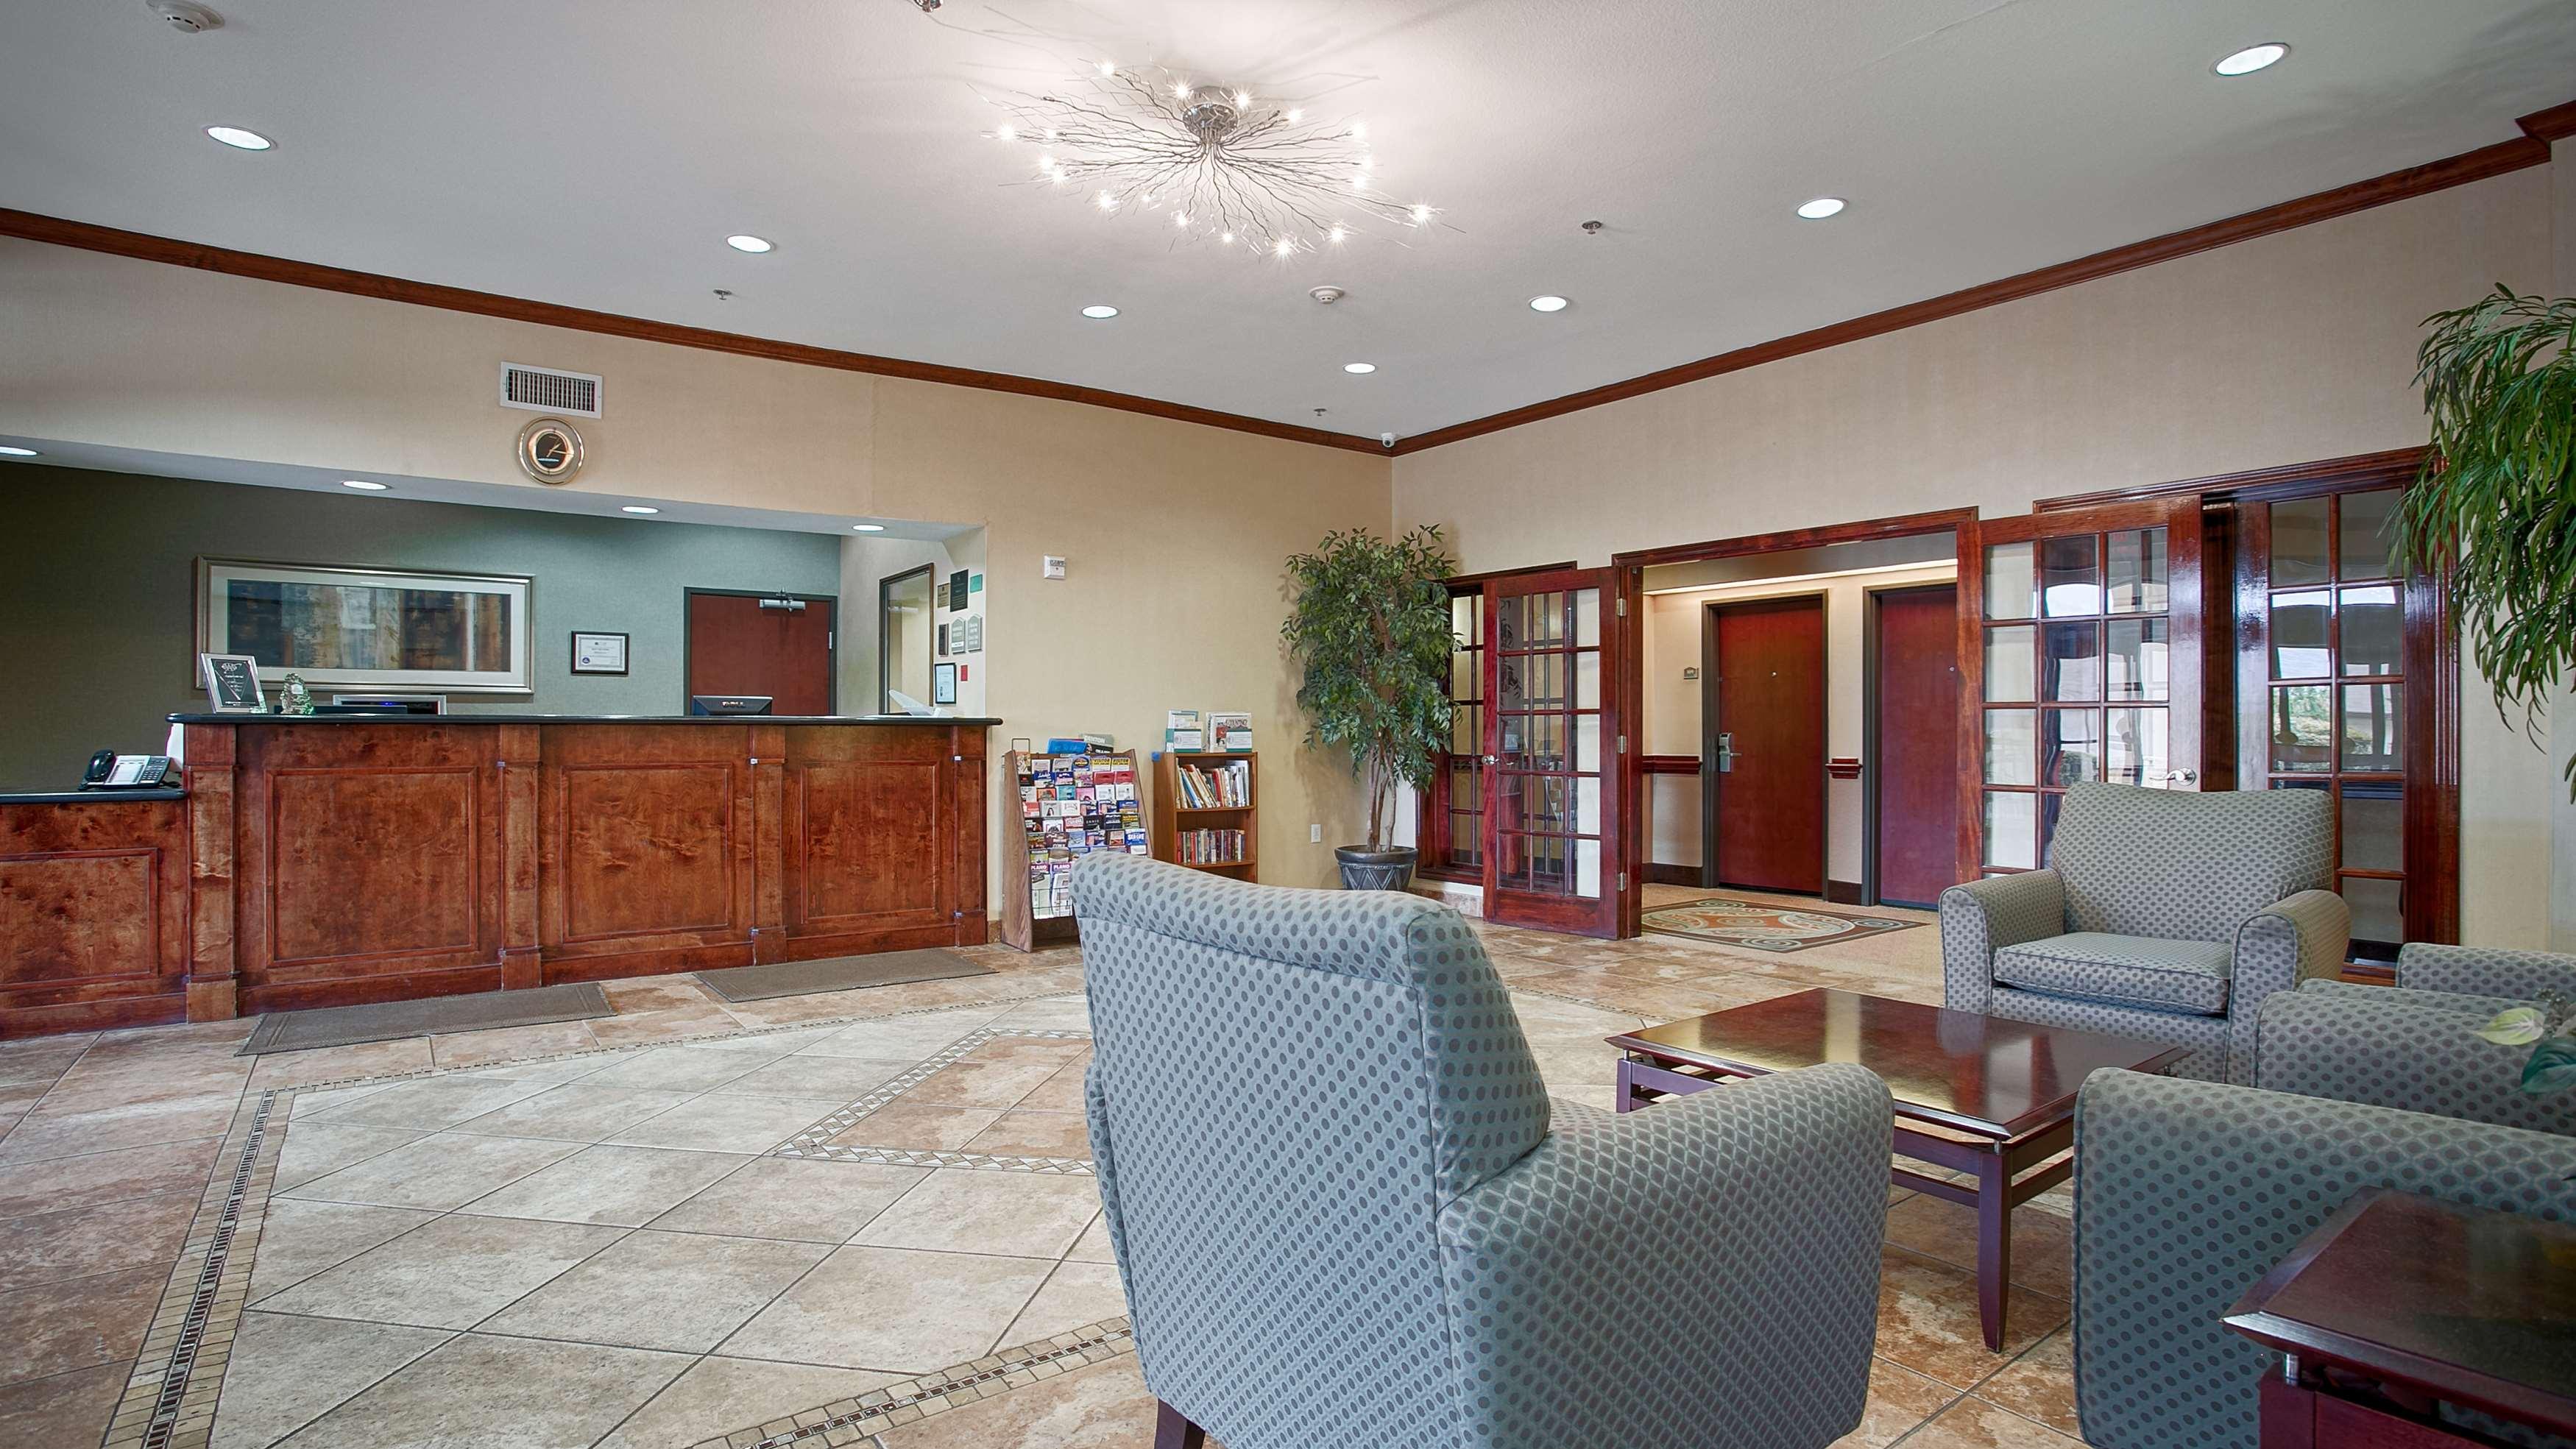 Mineola Tx Hotels And Motels